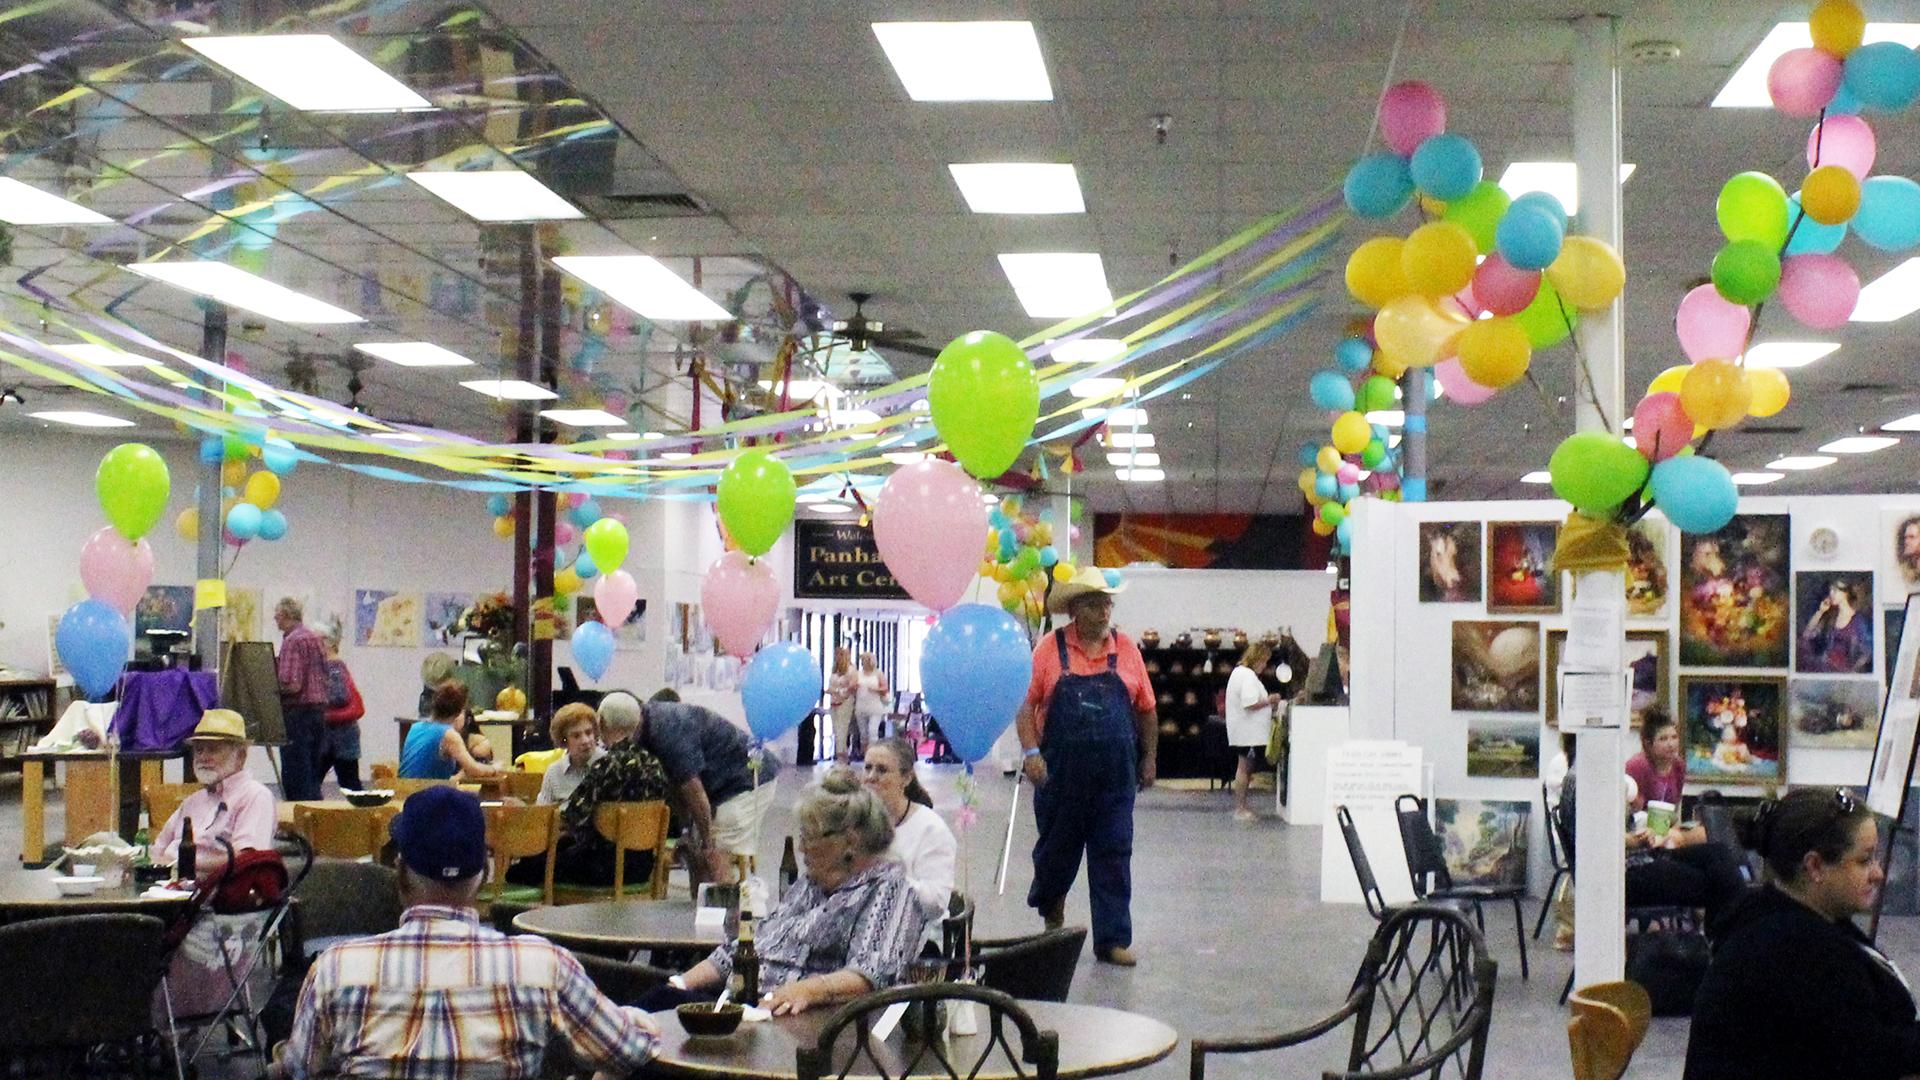 Handmade art, crafts, music in spotlight at annual All Things Artful festival